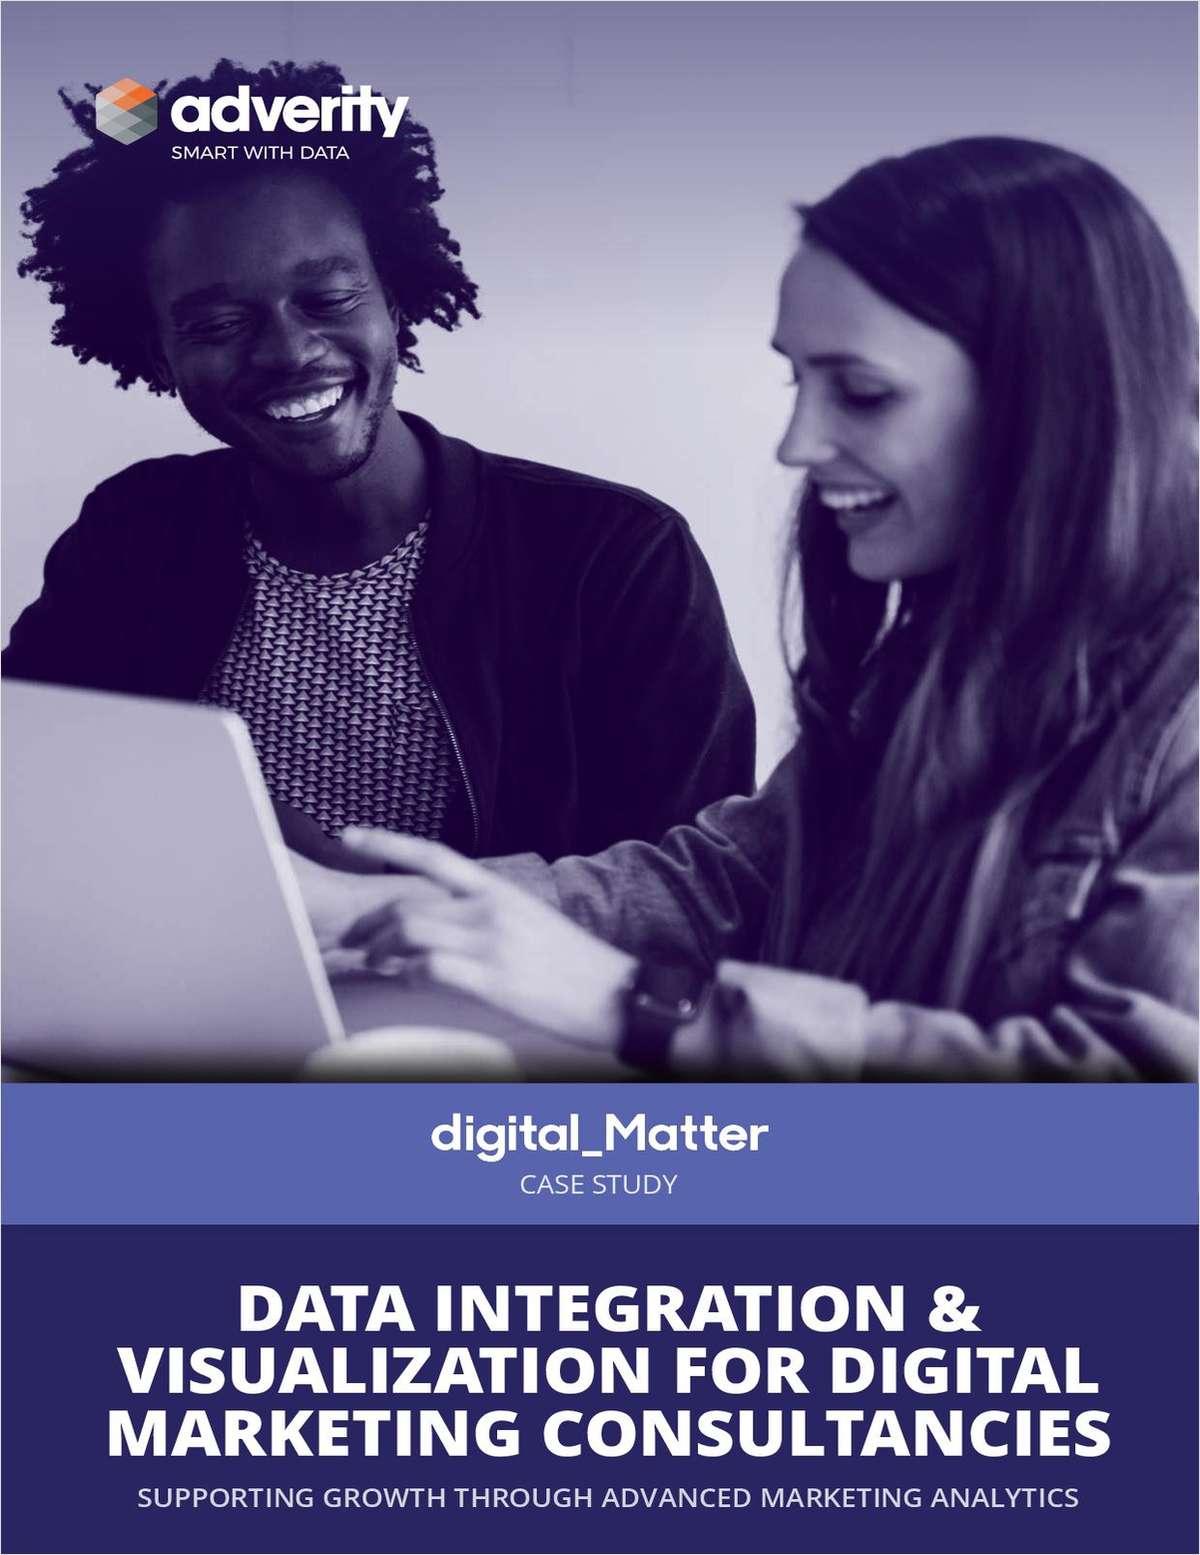 Digital Matter Case Study: Data Integration & Visualization For Digital Marketing Consultancies